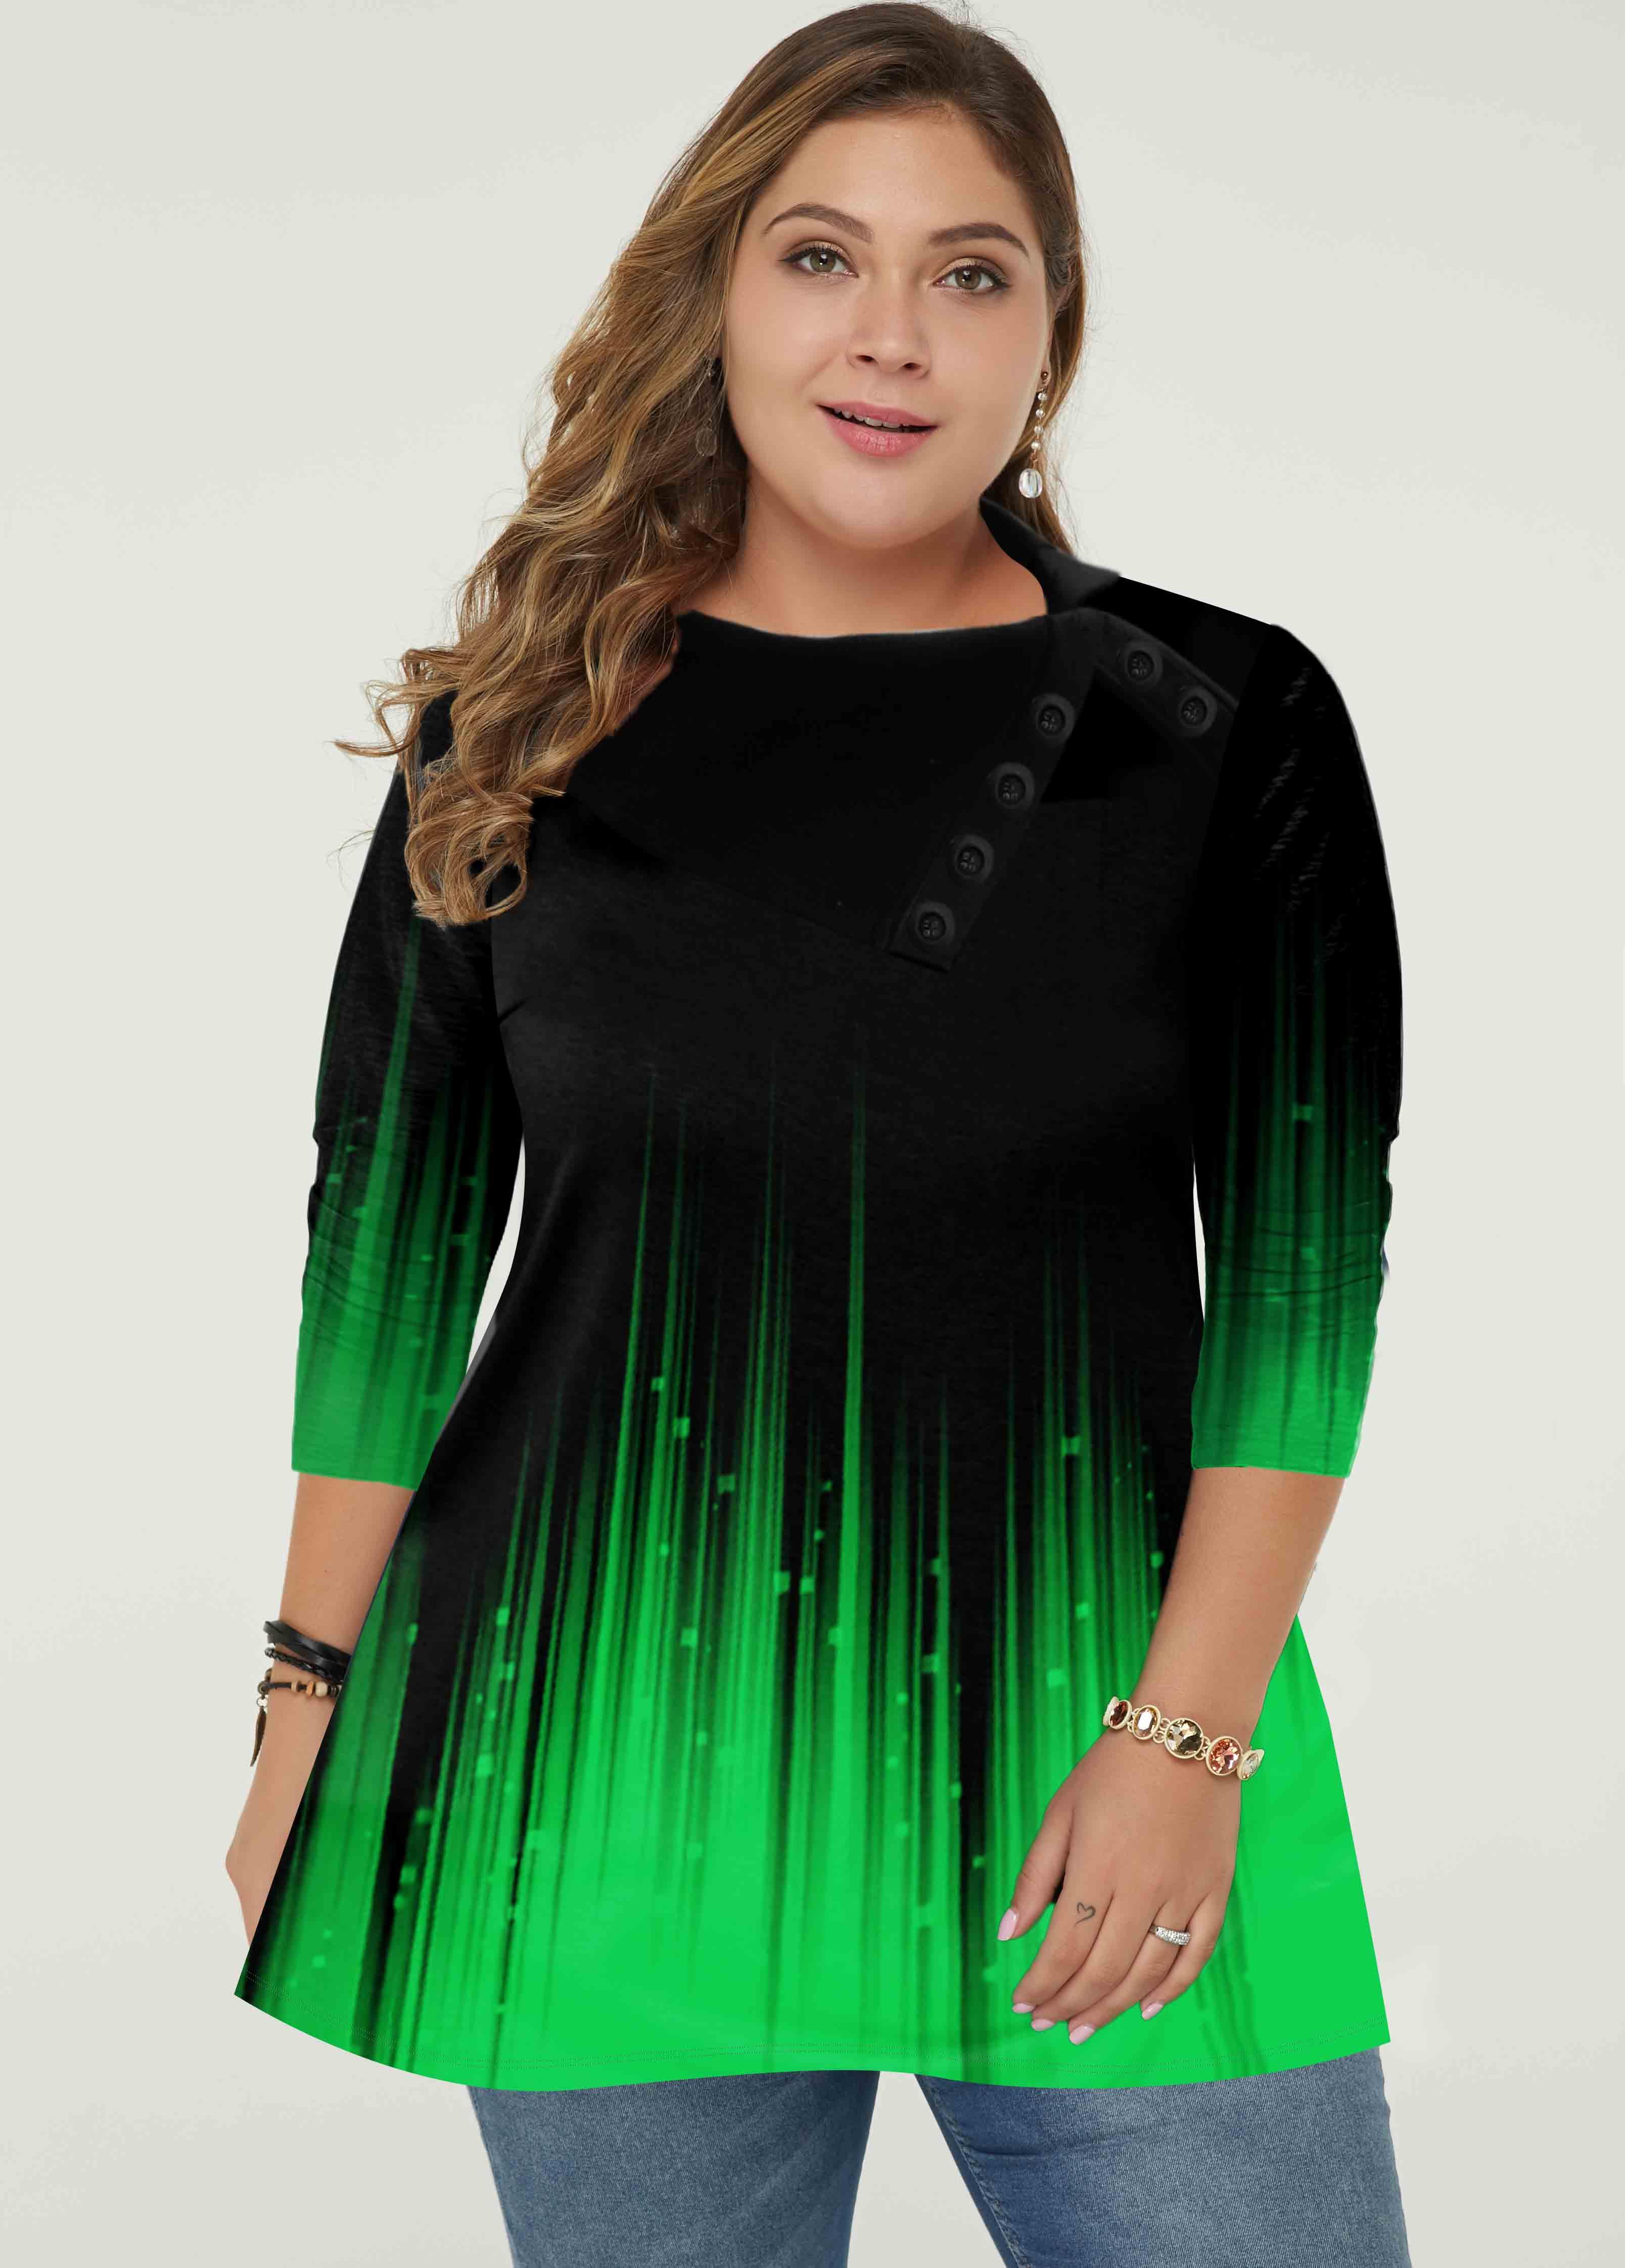 ROTITA Gradient Plus Size Green Long Sleeve Tunic Top